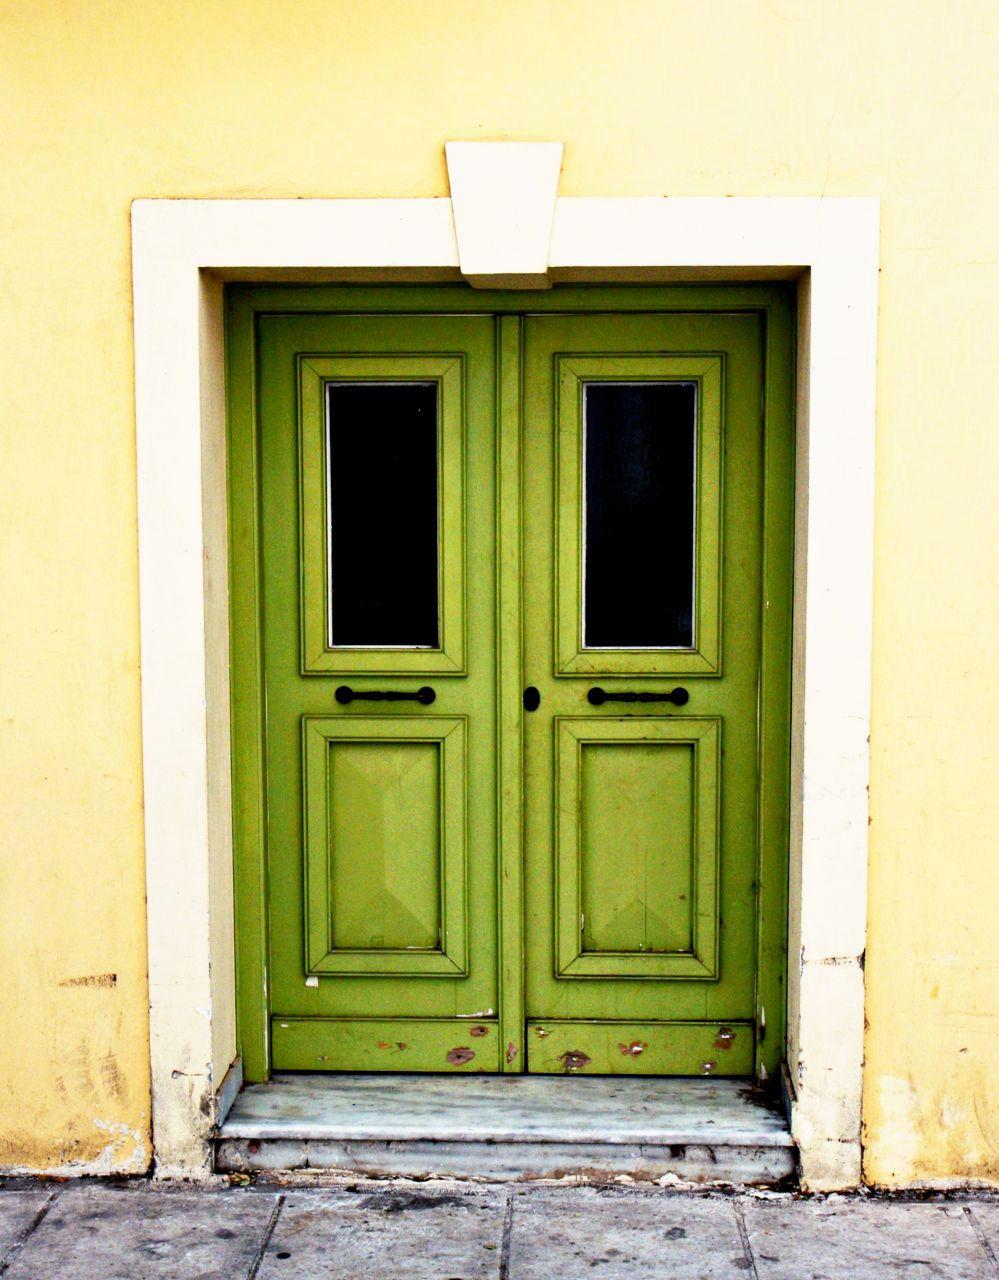 Green Door Photograph - Athens Greece Photo - Lime Kiwi - via Etsy. & Green Door Photograph - Athens Greece Photo - Lime Kiwi - via Etsy ...